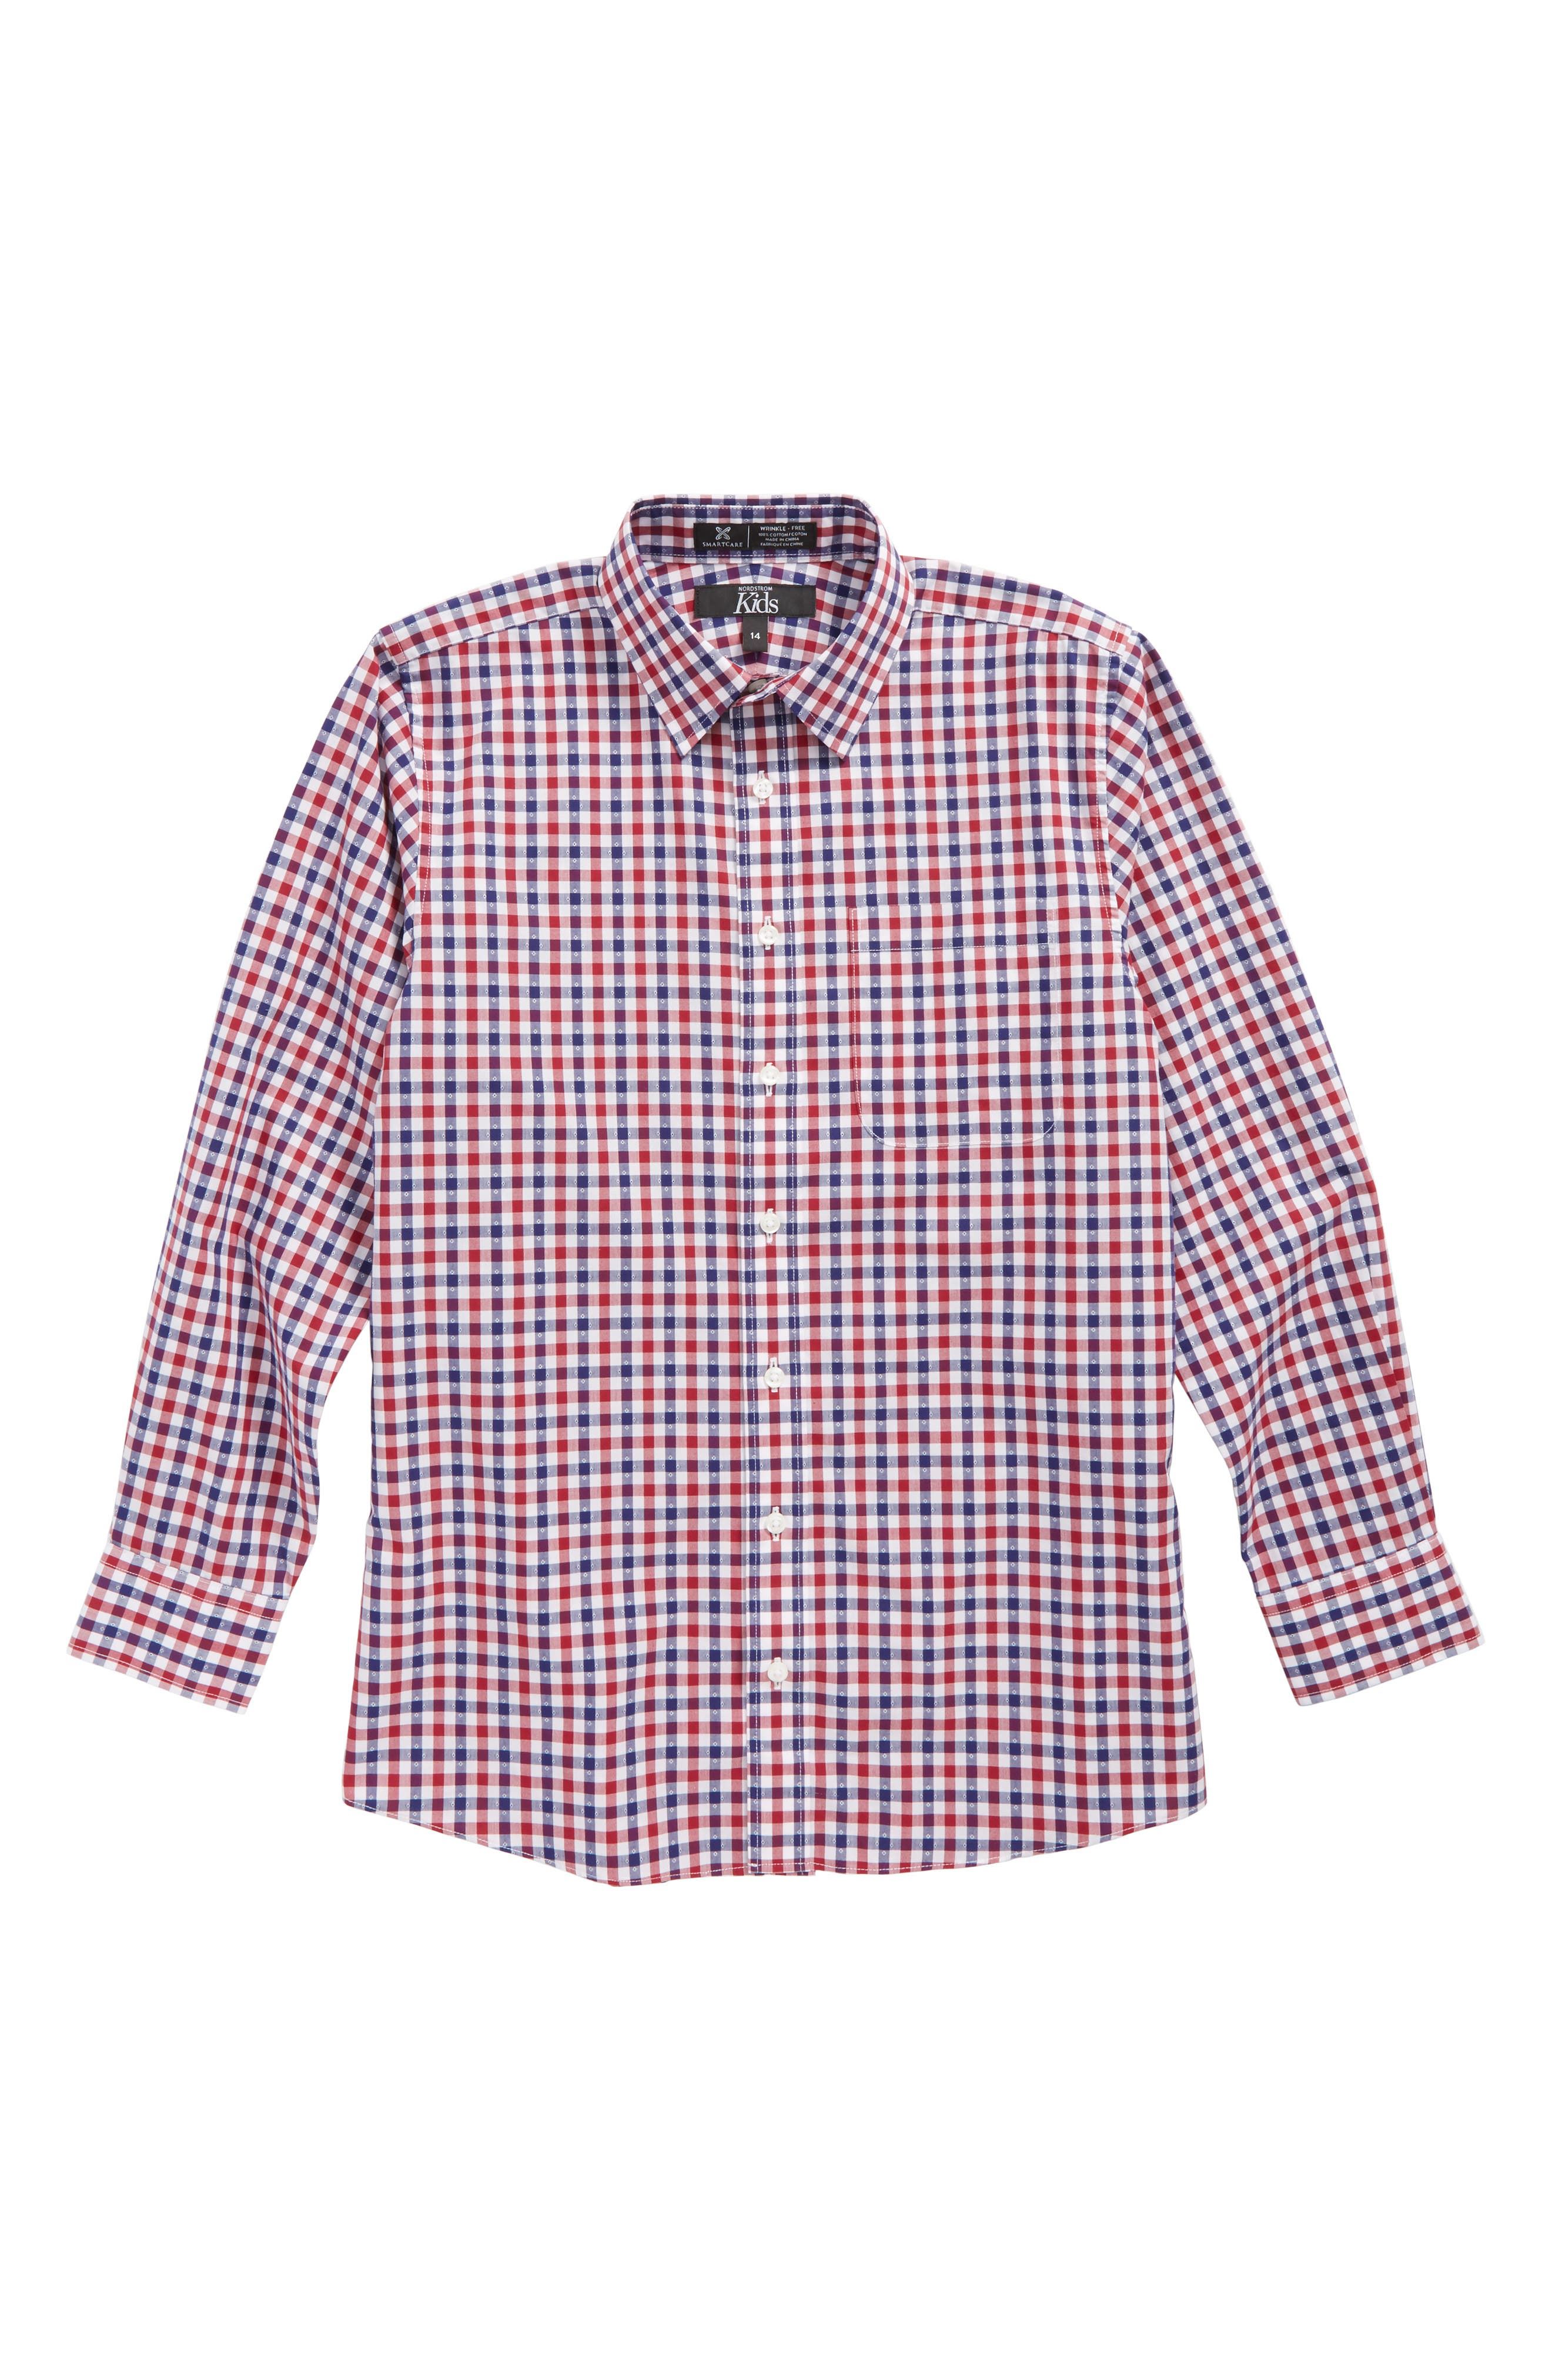 Dot Gingham Sport Shirt,                         Main,                         color, 601